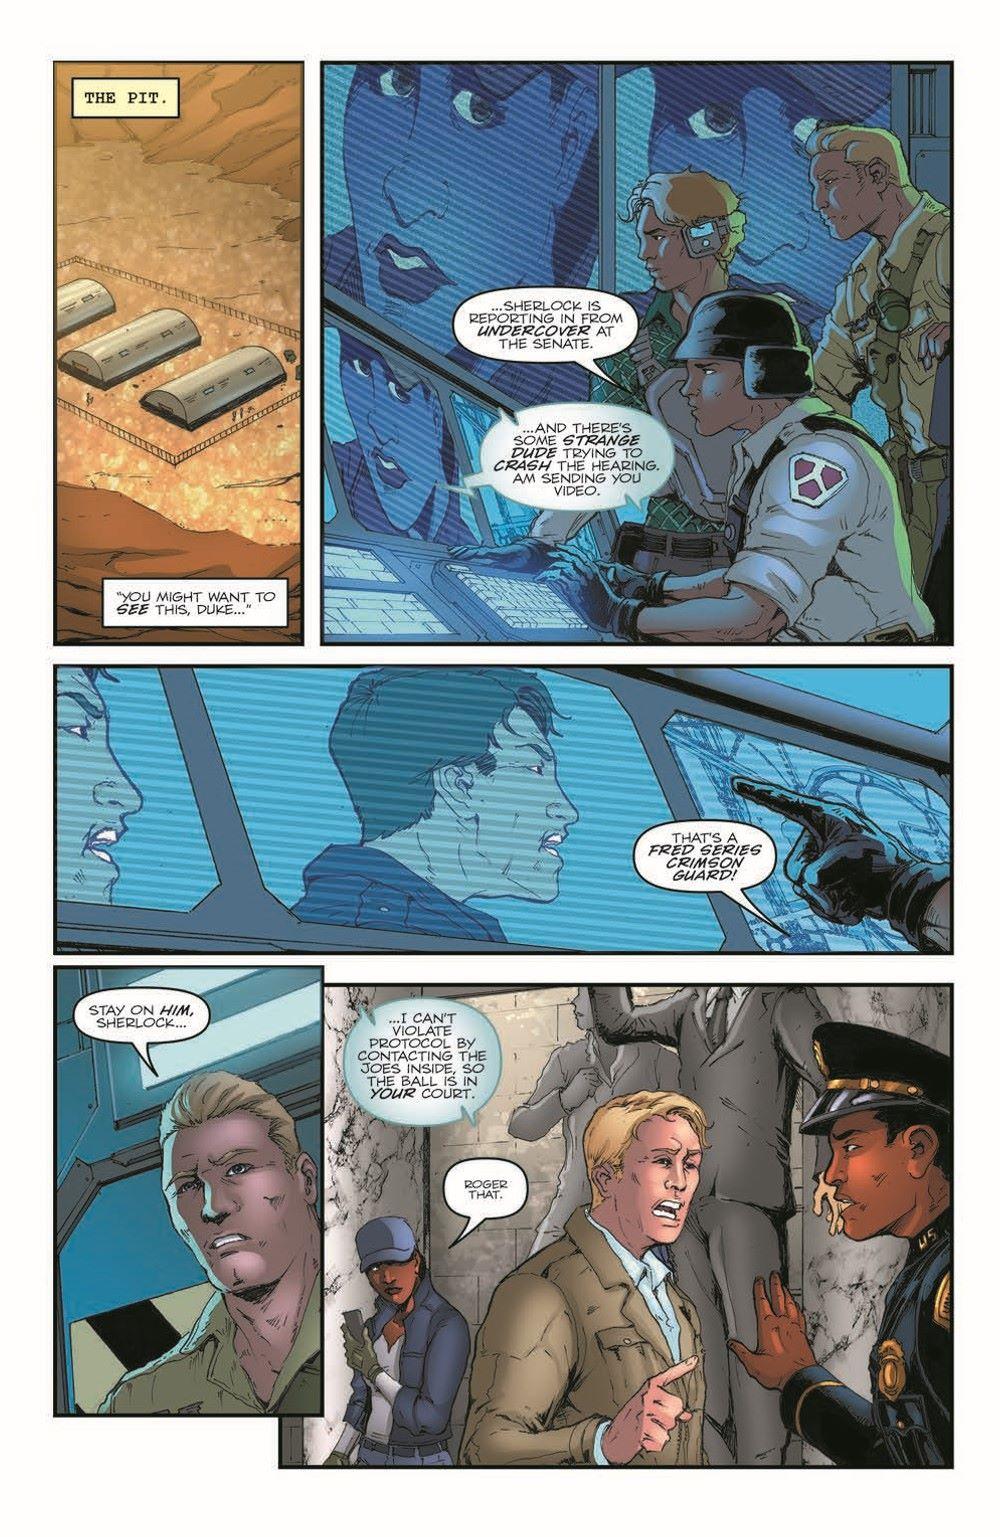 GIJoeRAH282-pr-7 ComicList Previews: G.I. JOE A REAL AMERICAN HERO #282